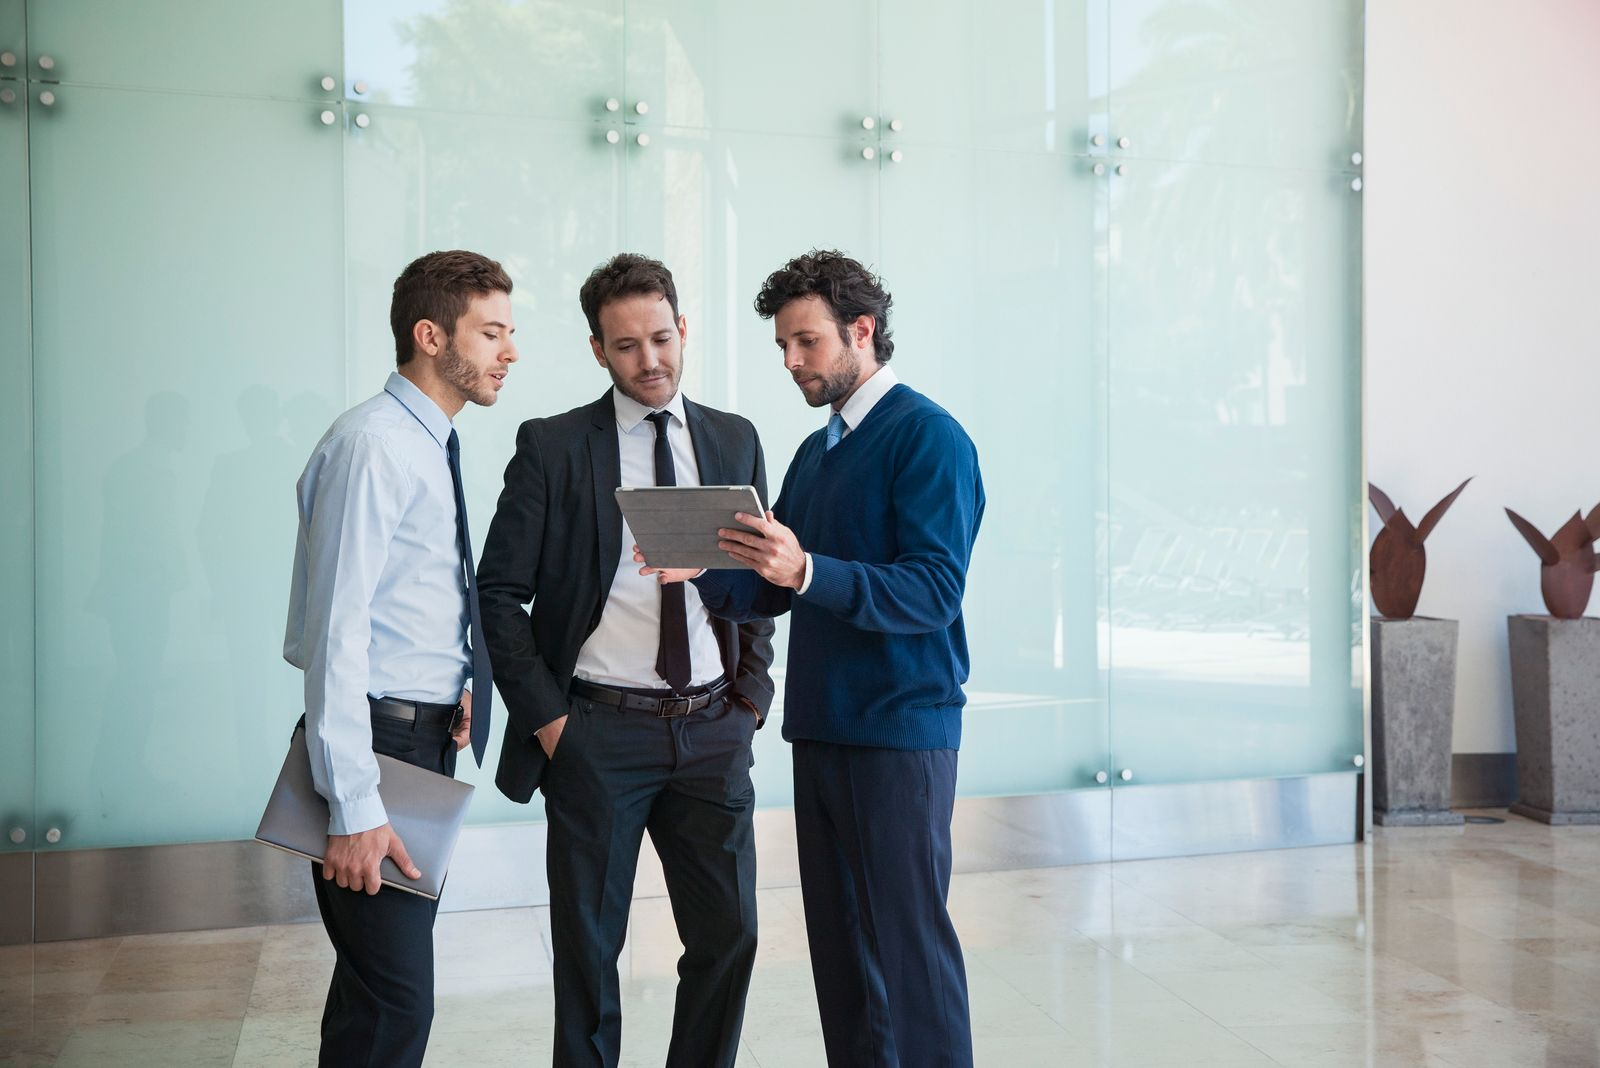 Businessman presenting idea to associates using digital tablet